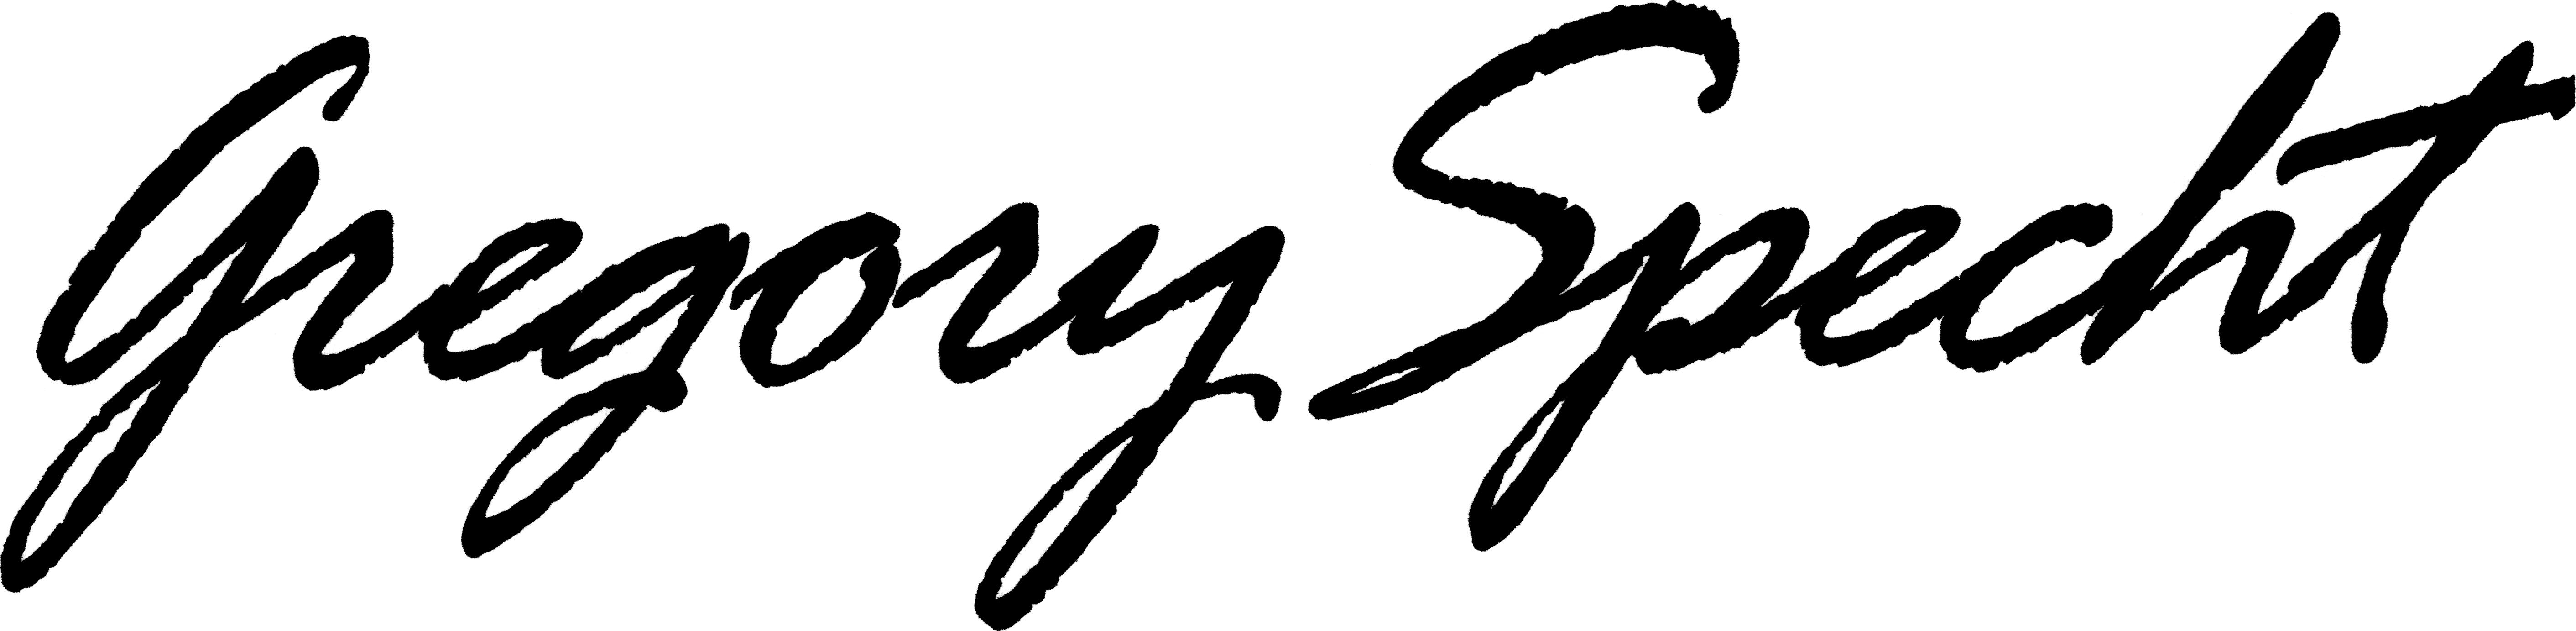 Gregory Specht's Signature